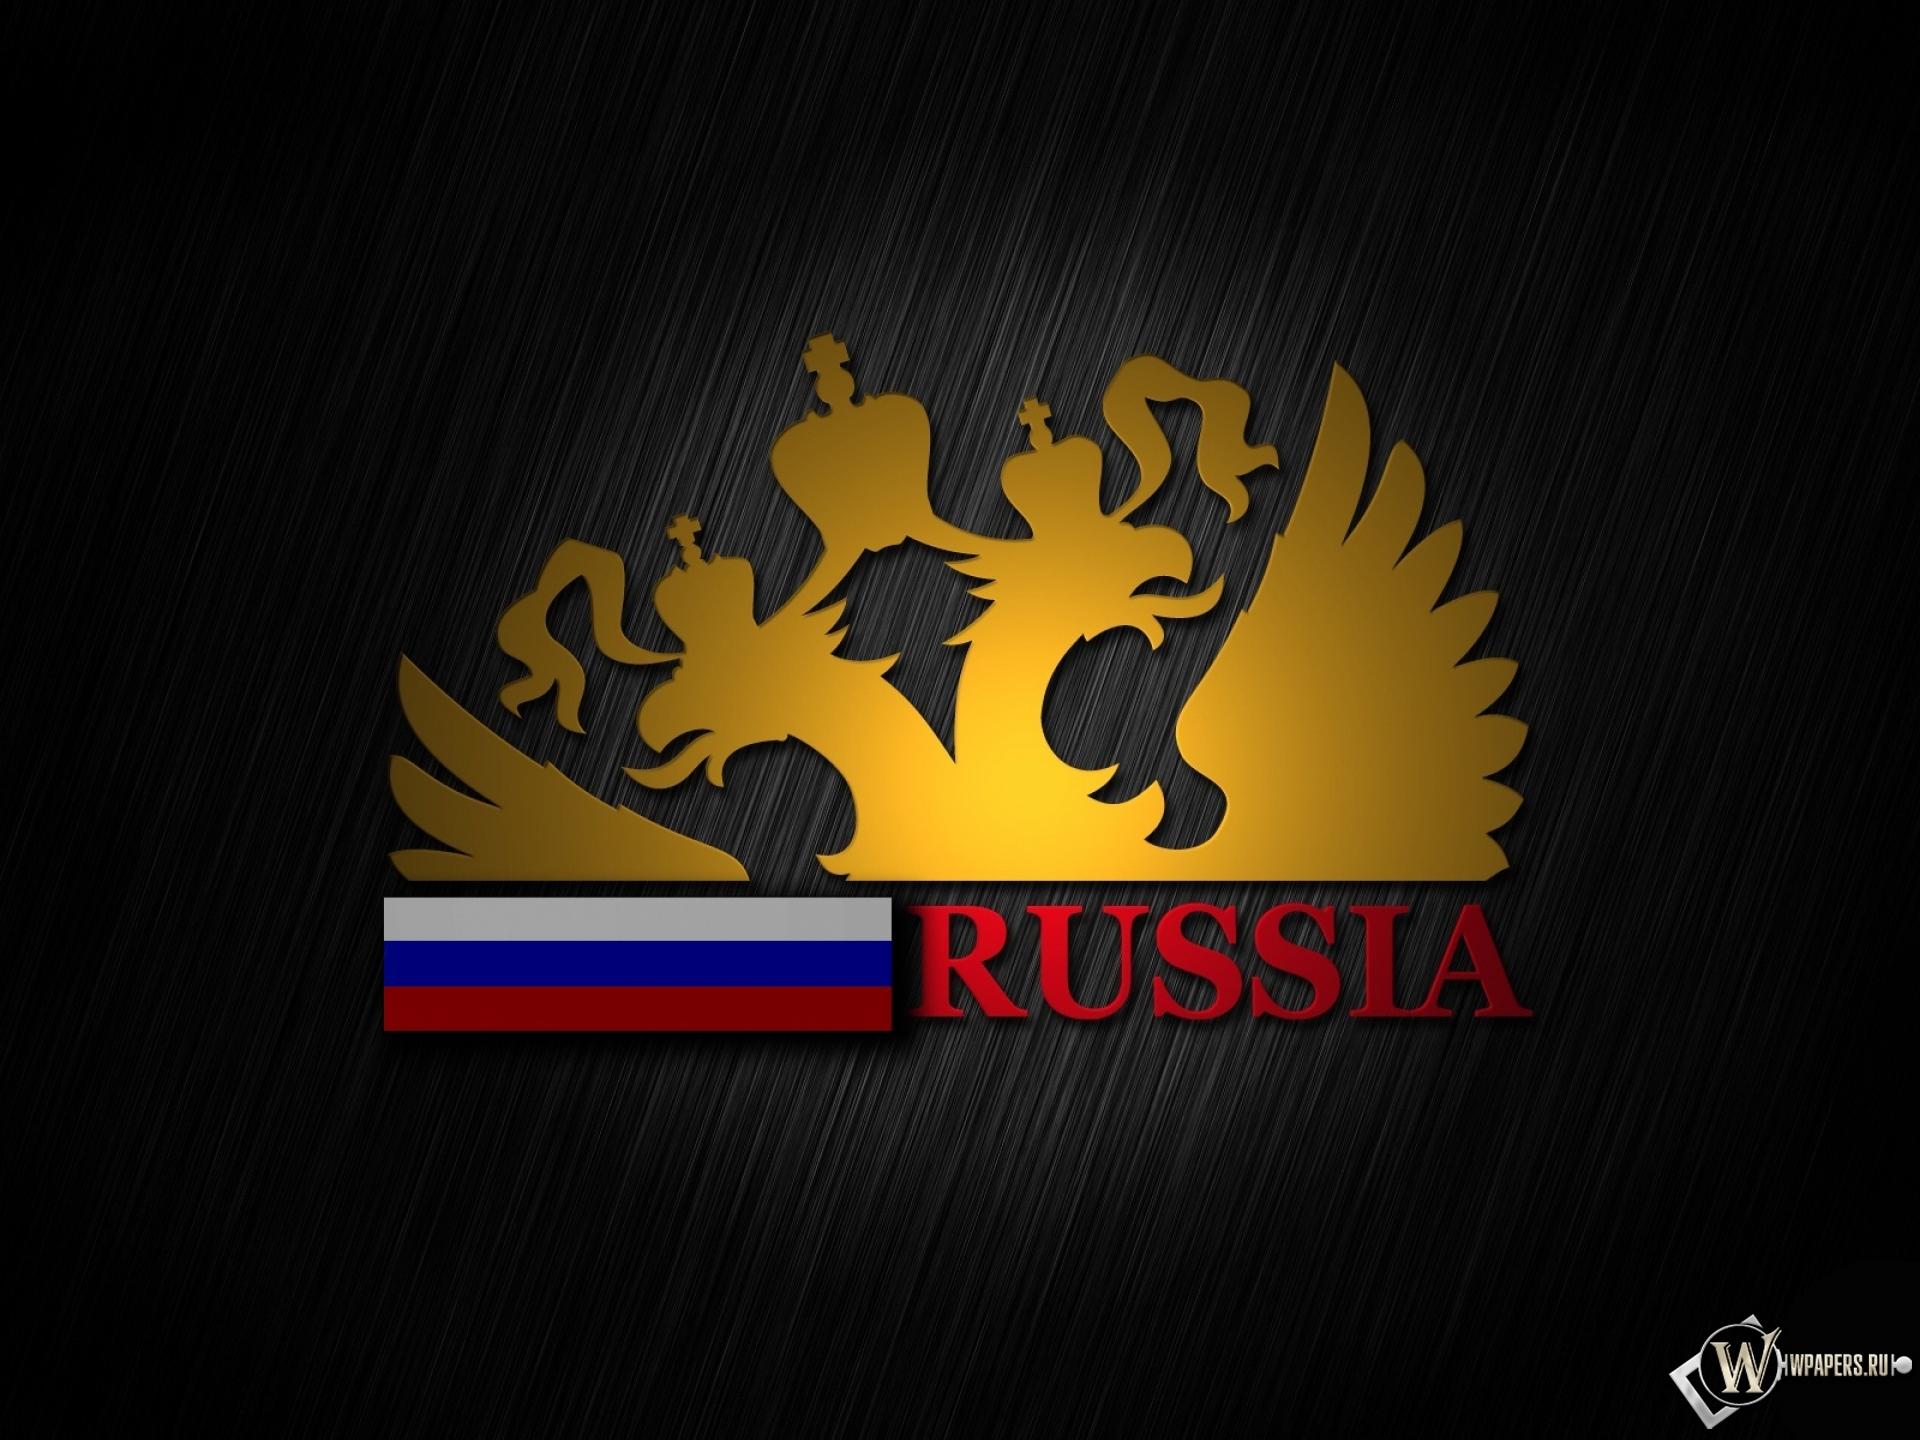 Герб, Флаг) для рабочего стола 1920х1440 (4:3 ...: wpapers.ru/wallpapers/All/10726/1920-1440_Россия.html